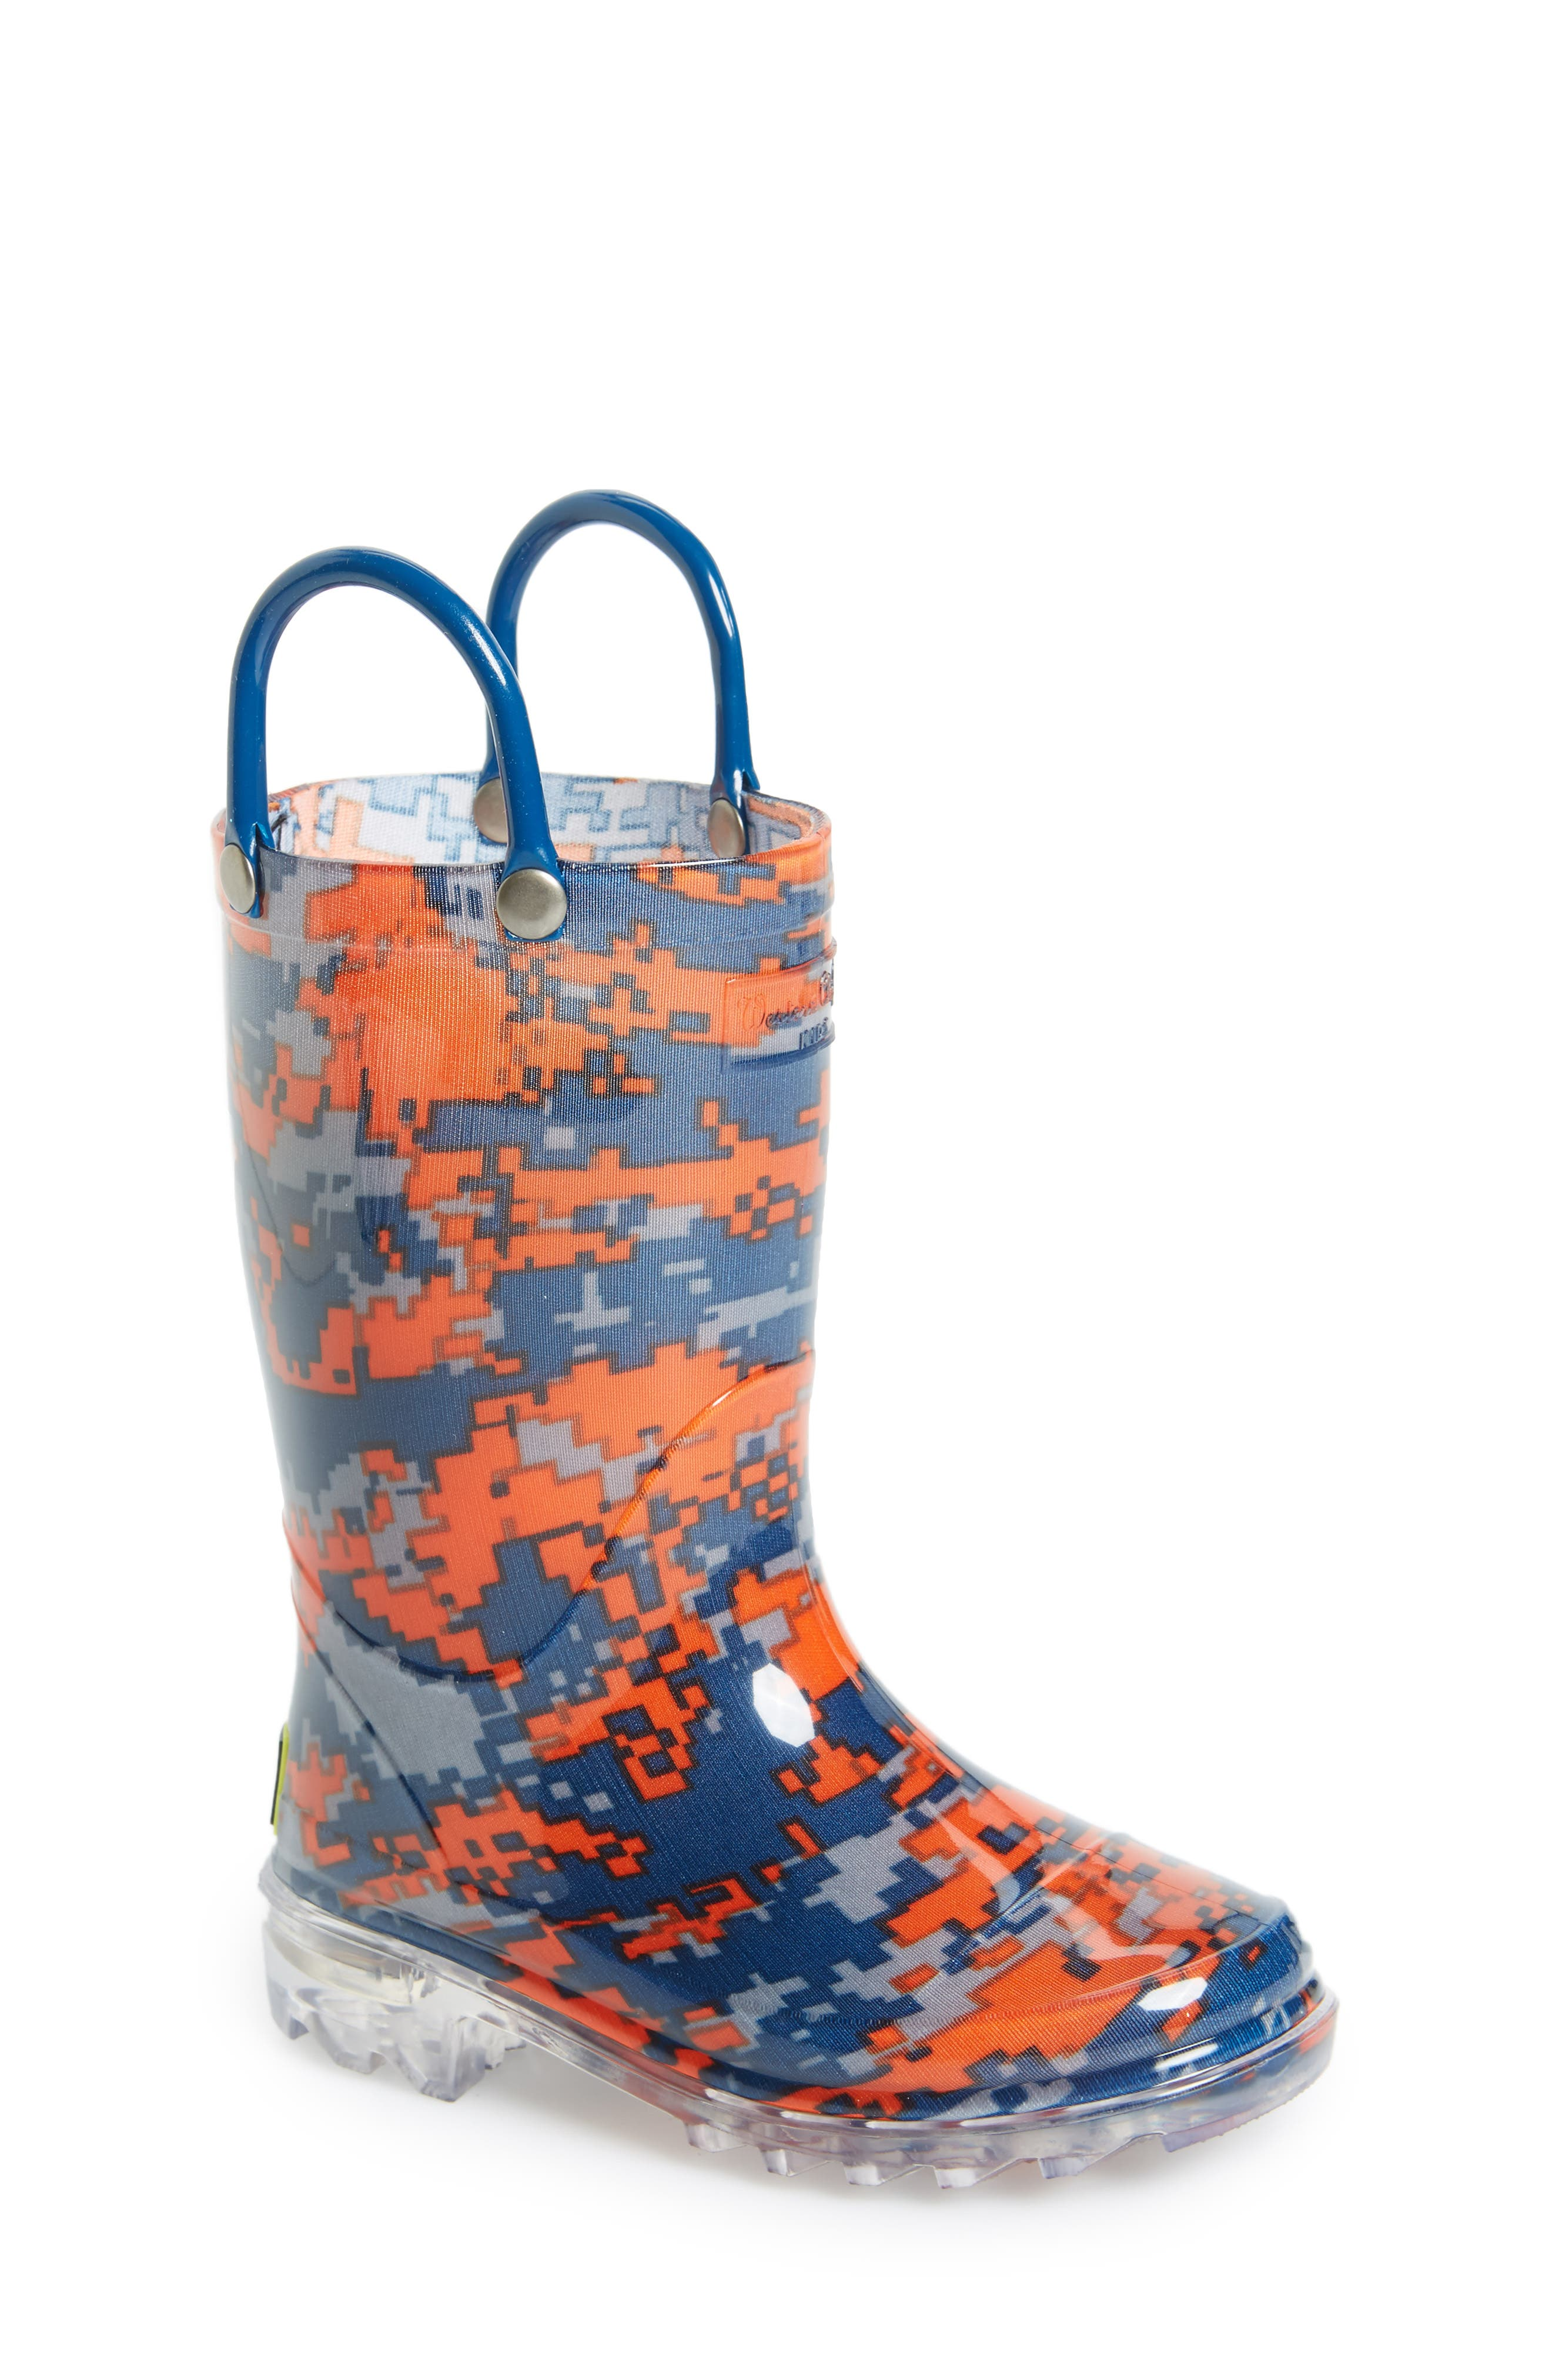 WESTERN CHIEF Digital Camo Light-Up Rain Boot